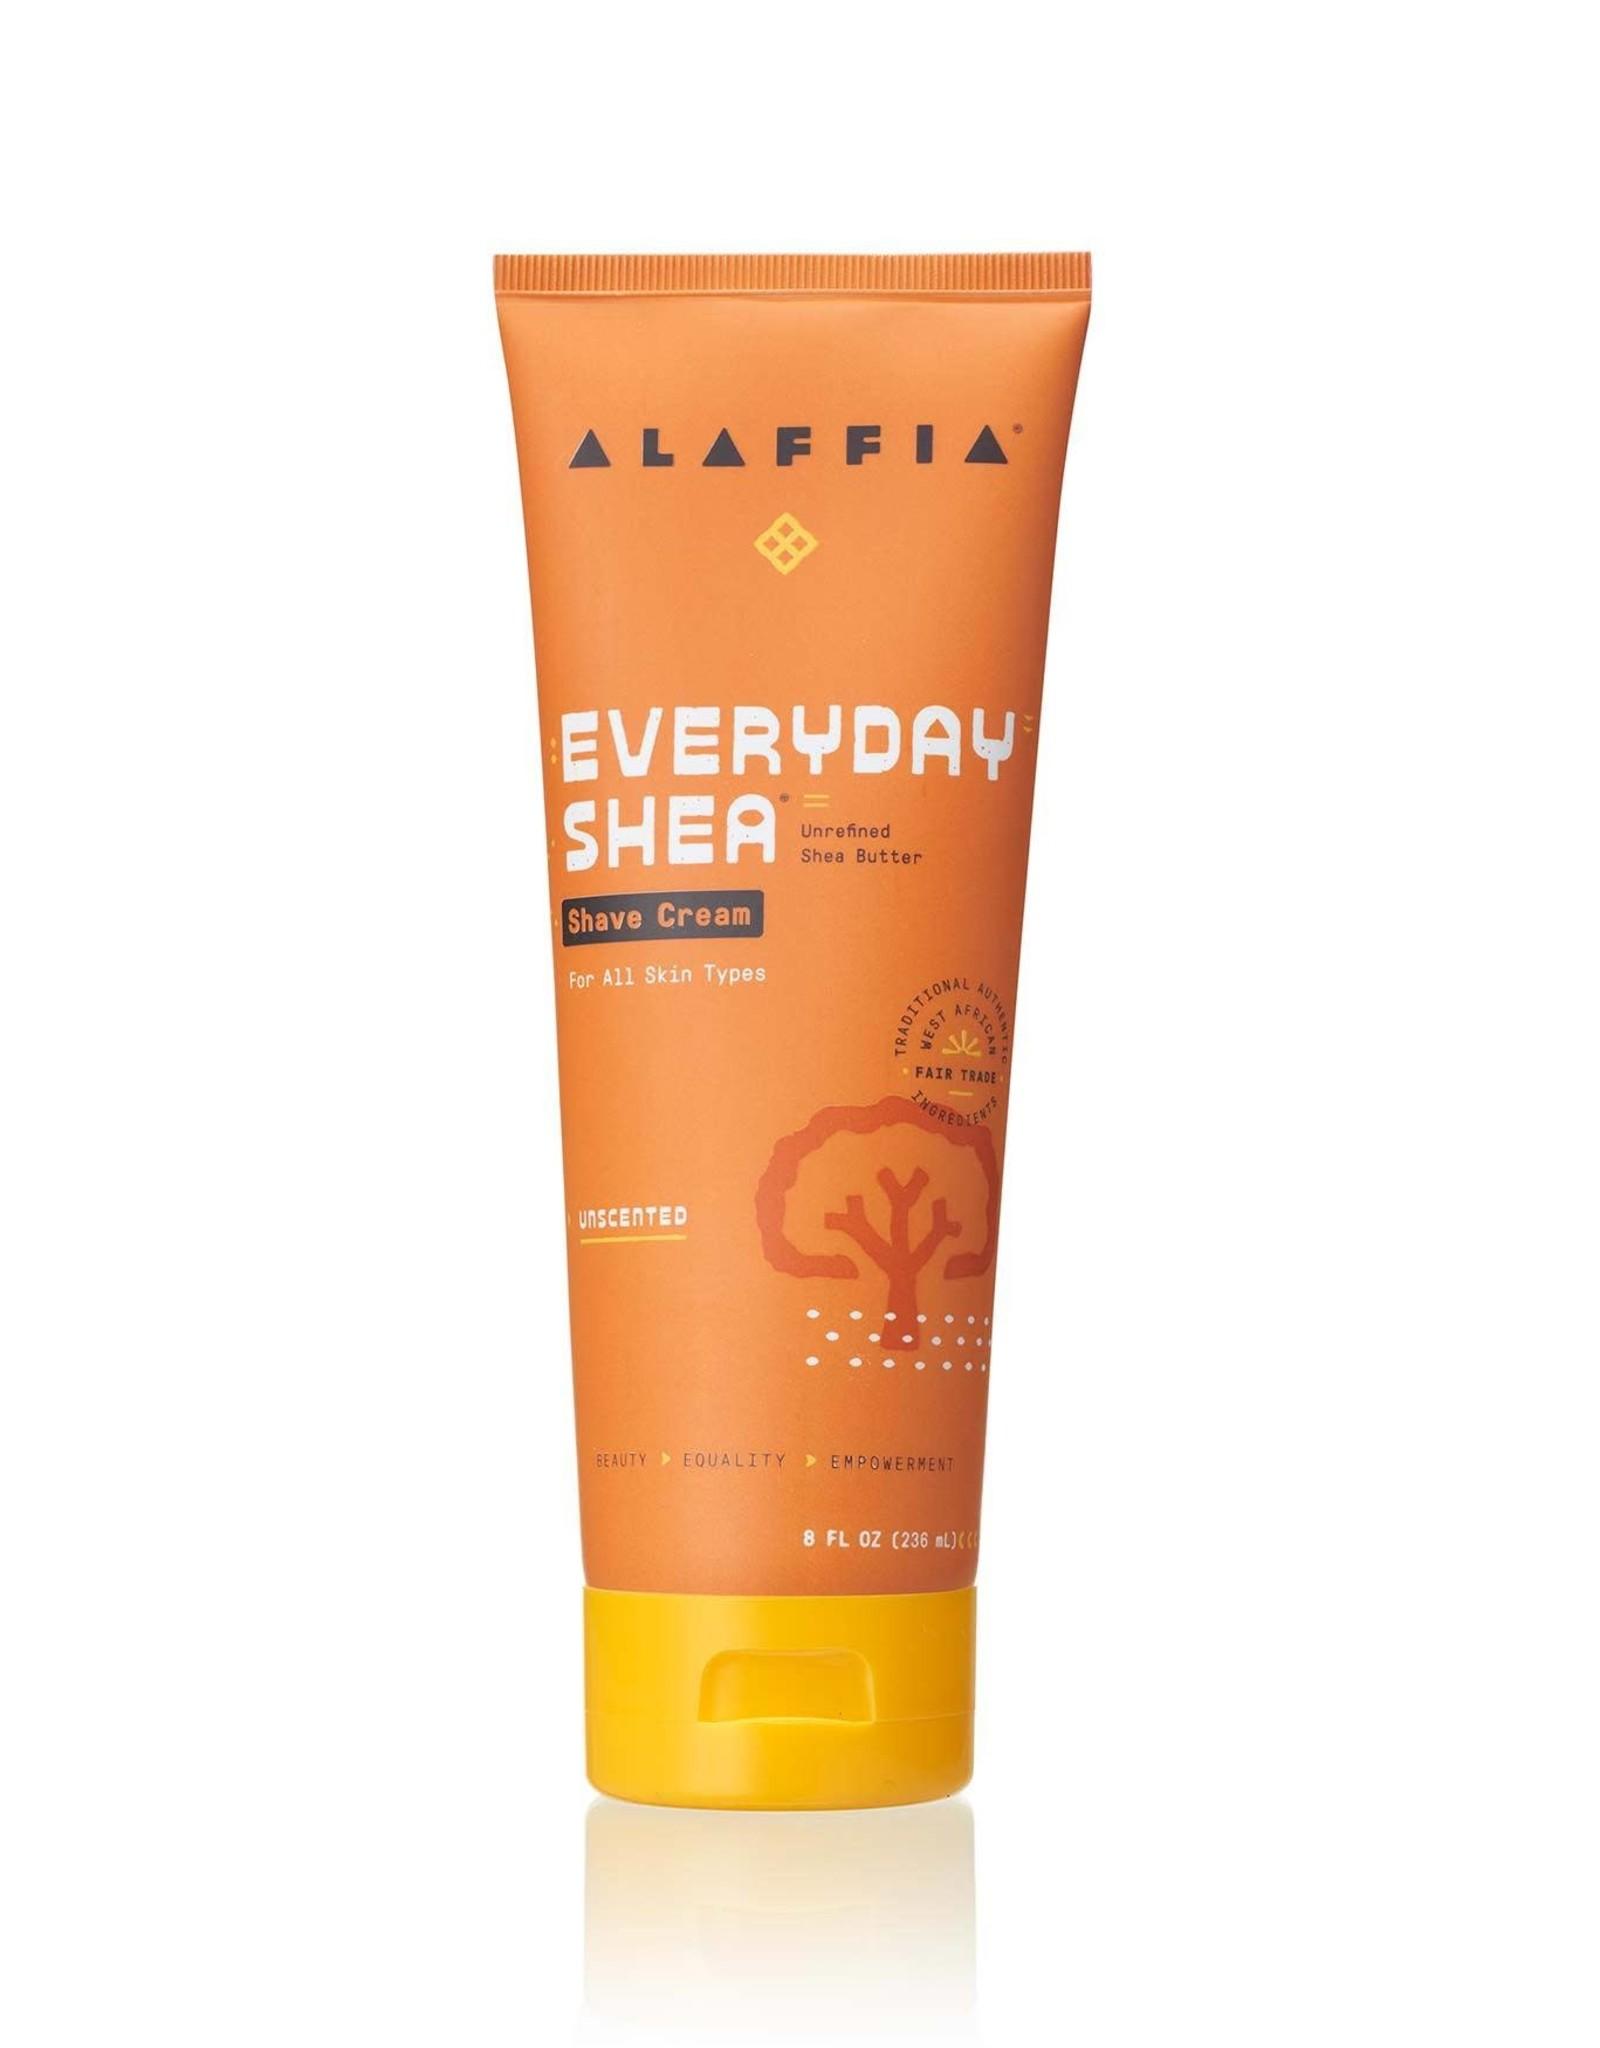 Alaffia EveryDay Shea Shave